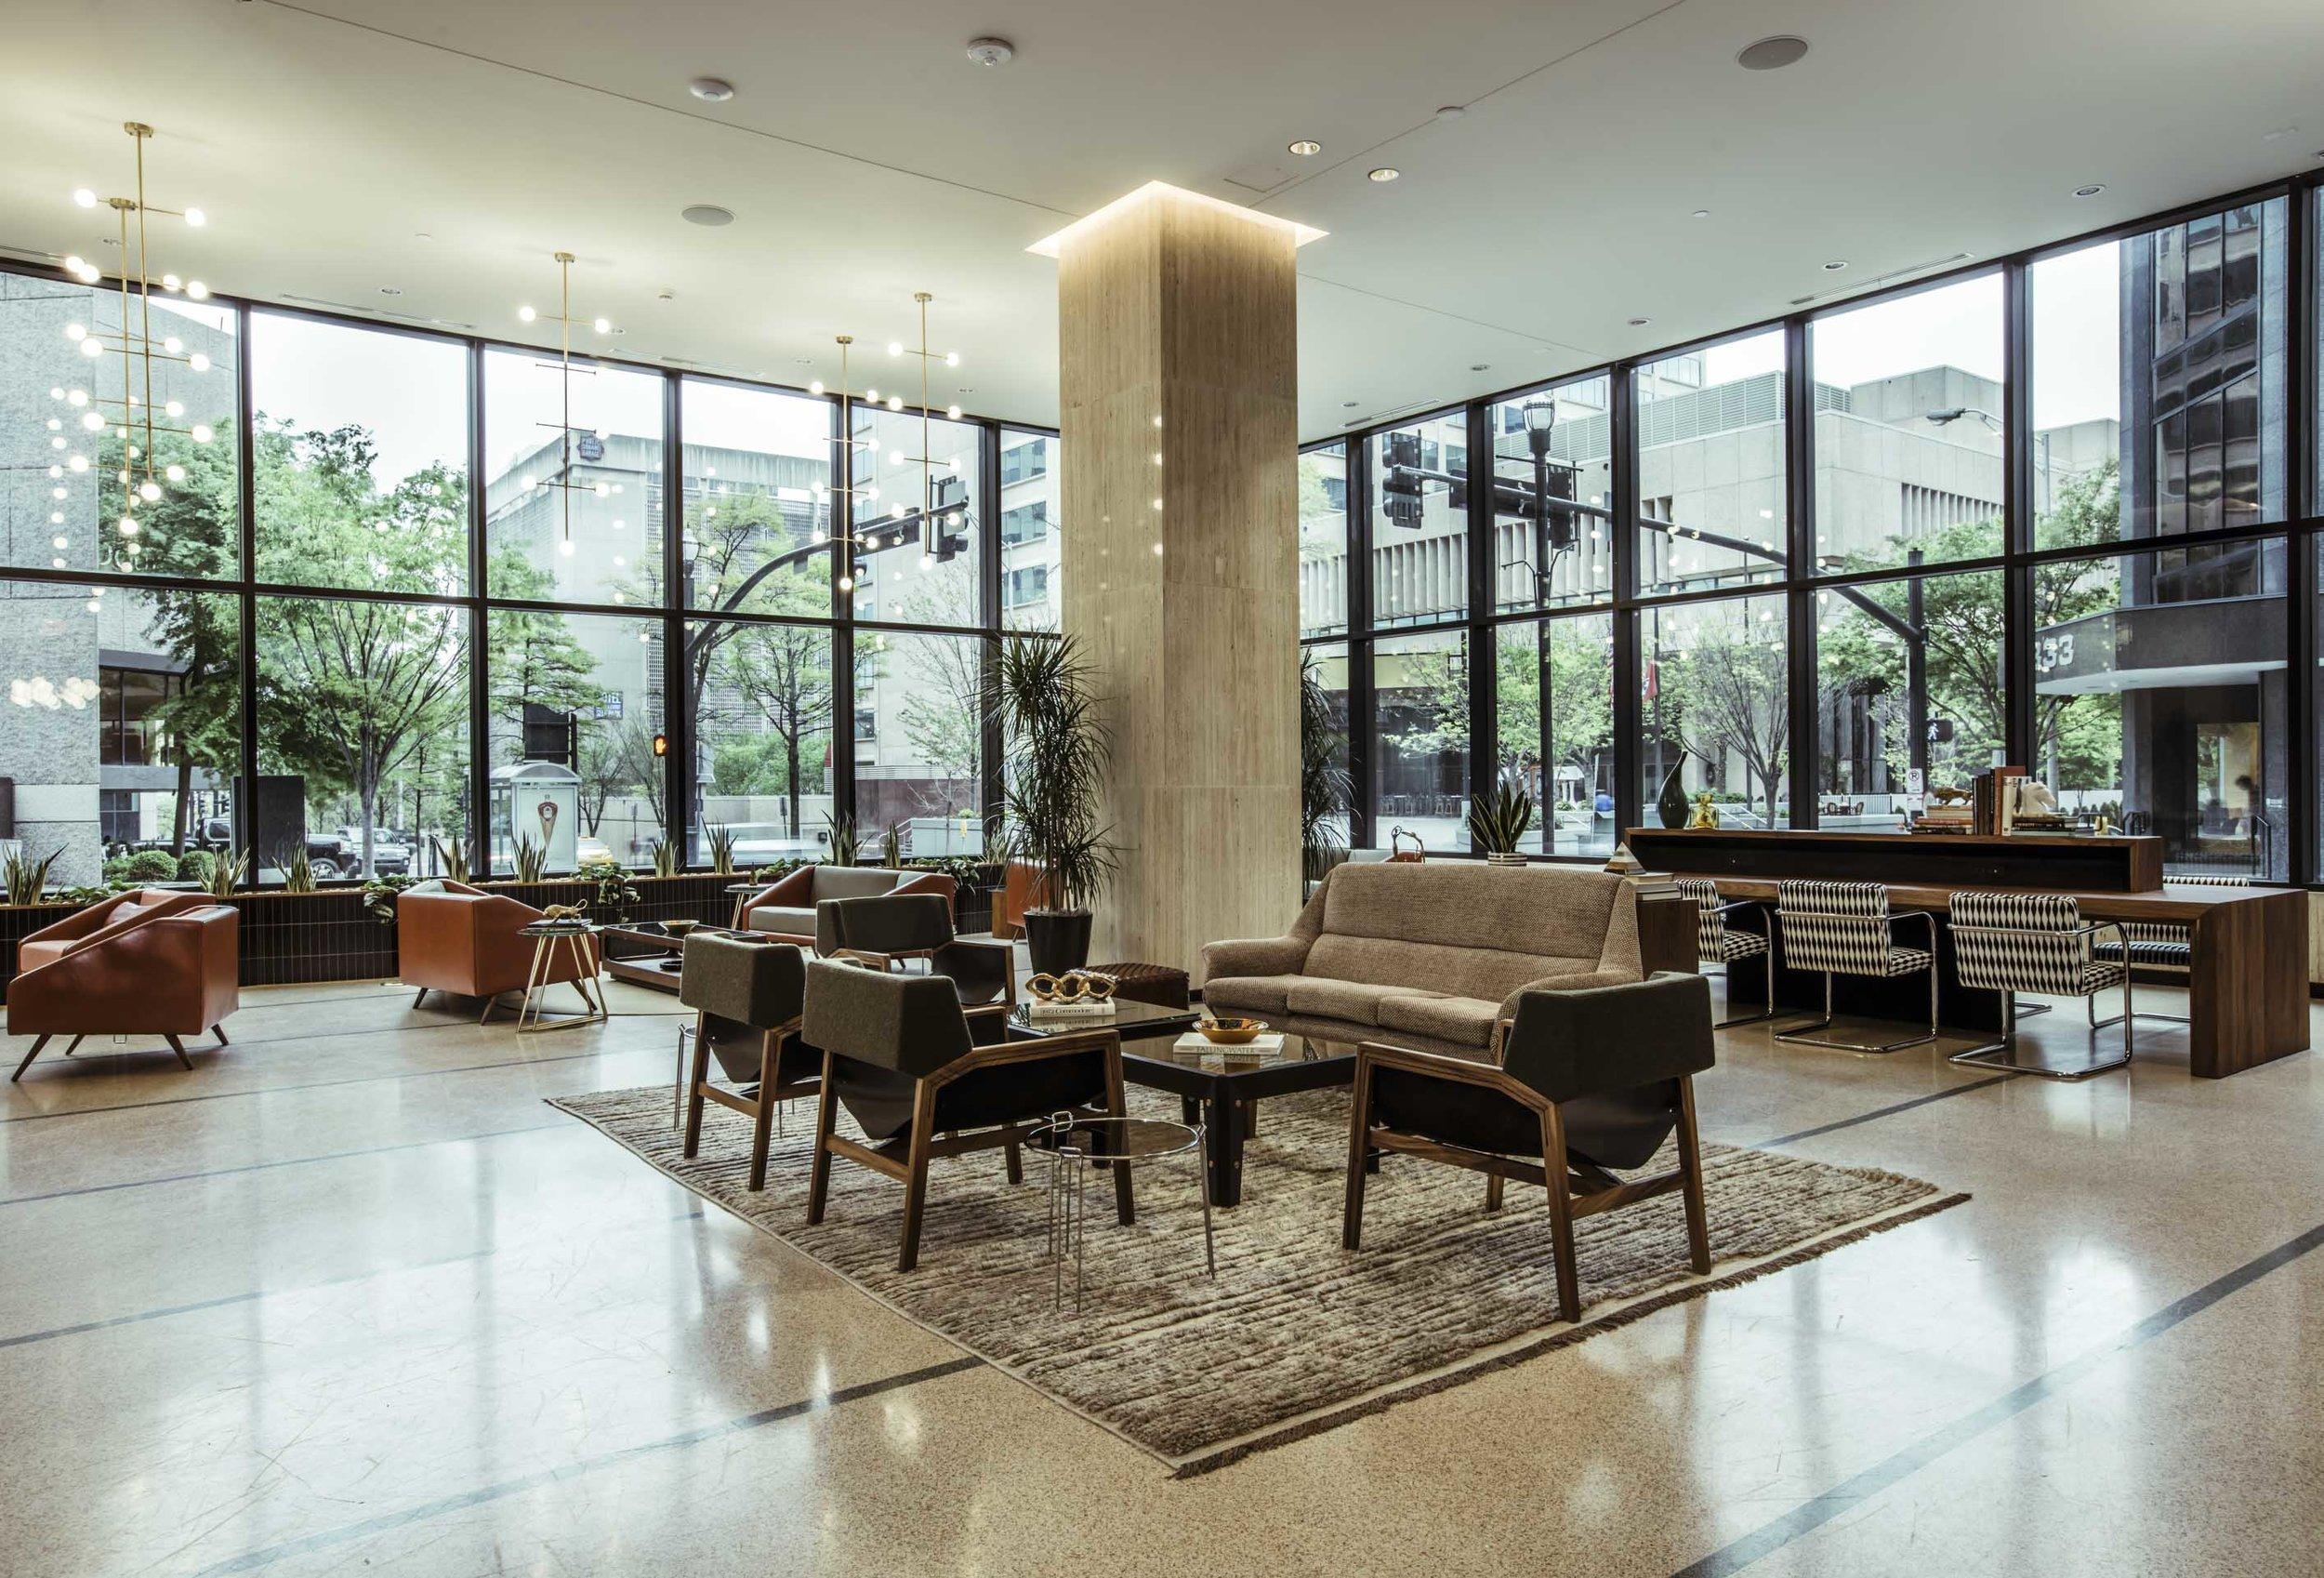 FAIRLANE HOTEL ARCHITECTURE WEB RES-1.jpg